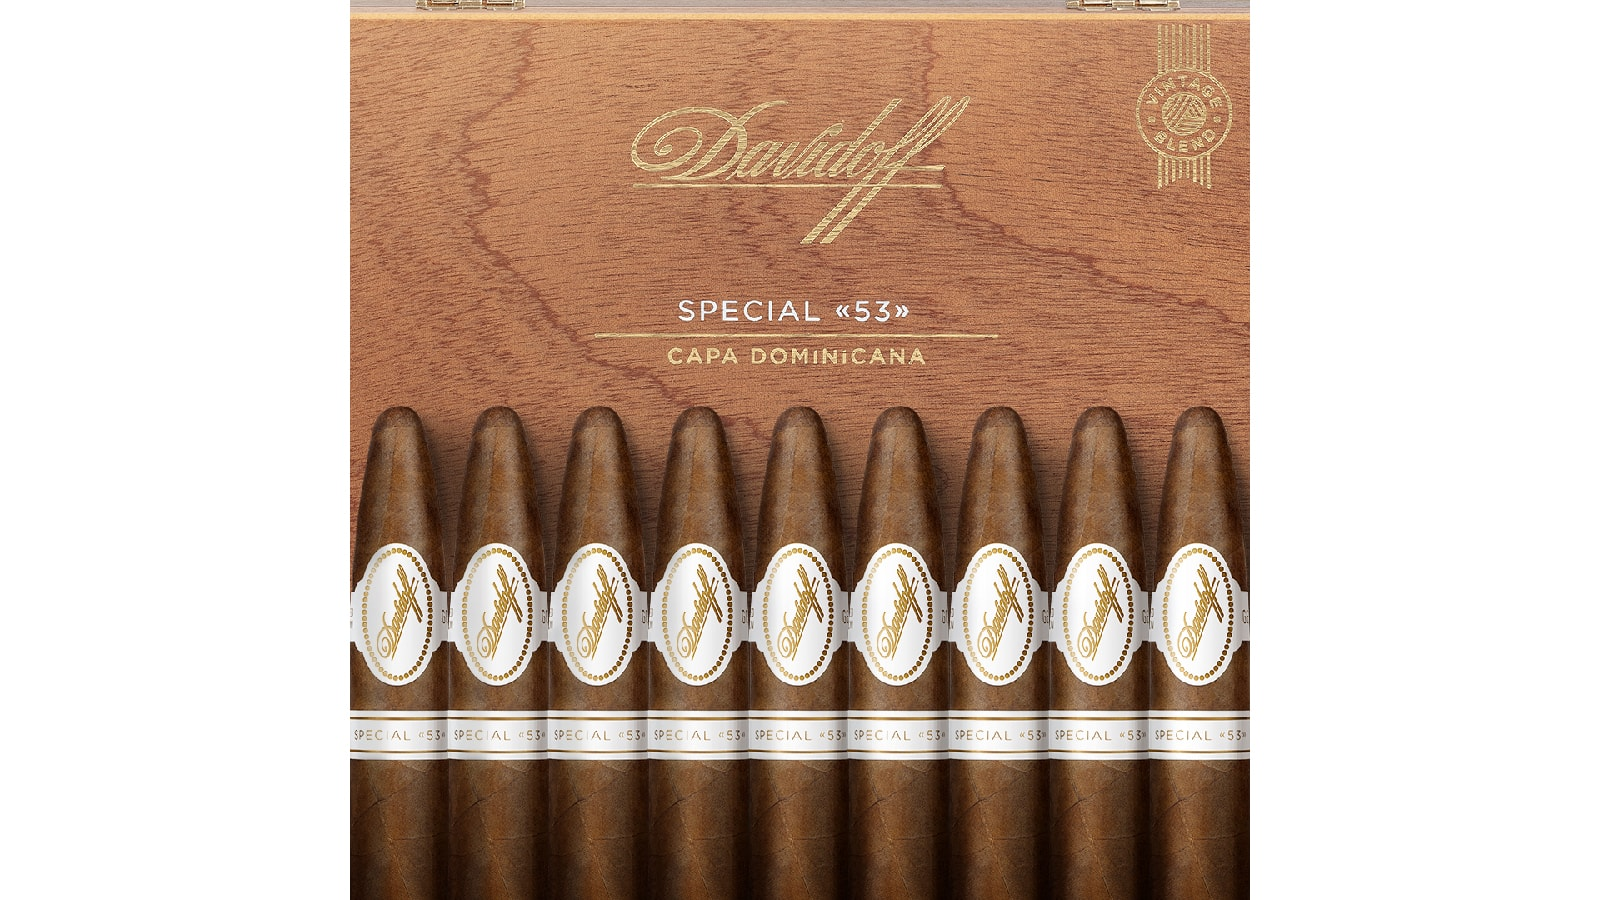 Davidoff Special 53 - Capa Dominicana